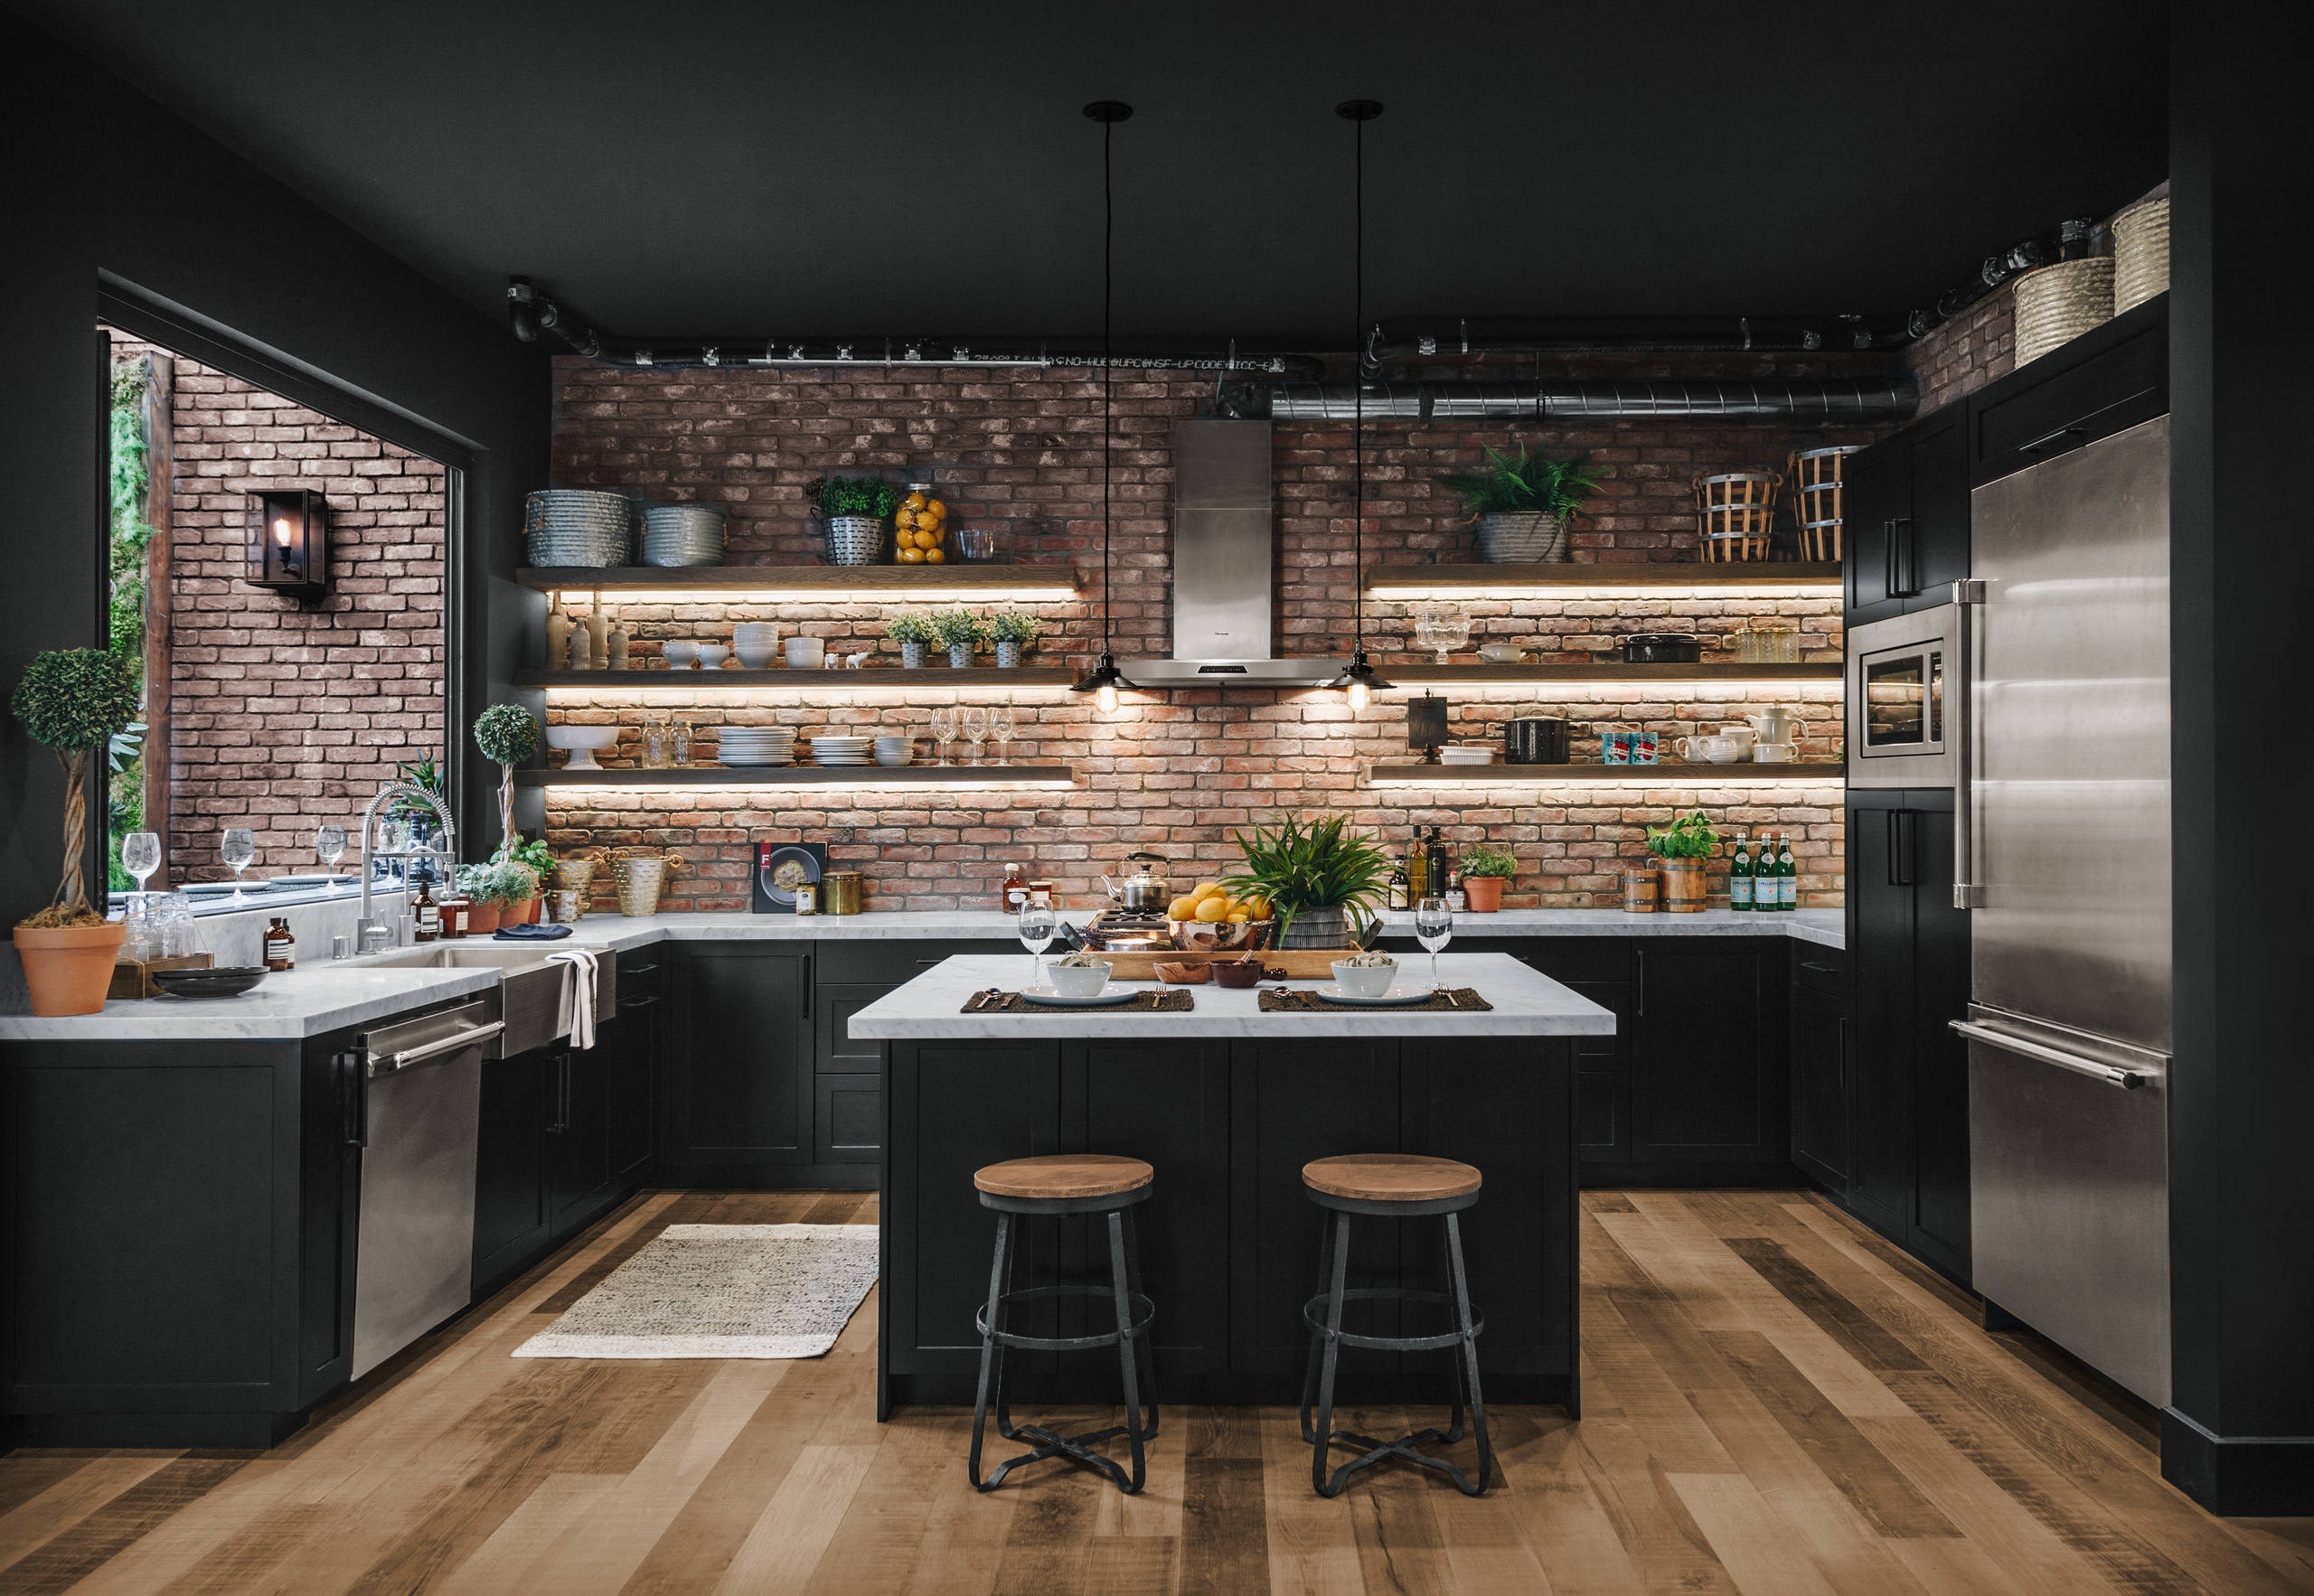 Industrial style kitchen | Source: goinside.com